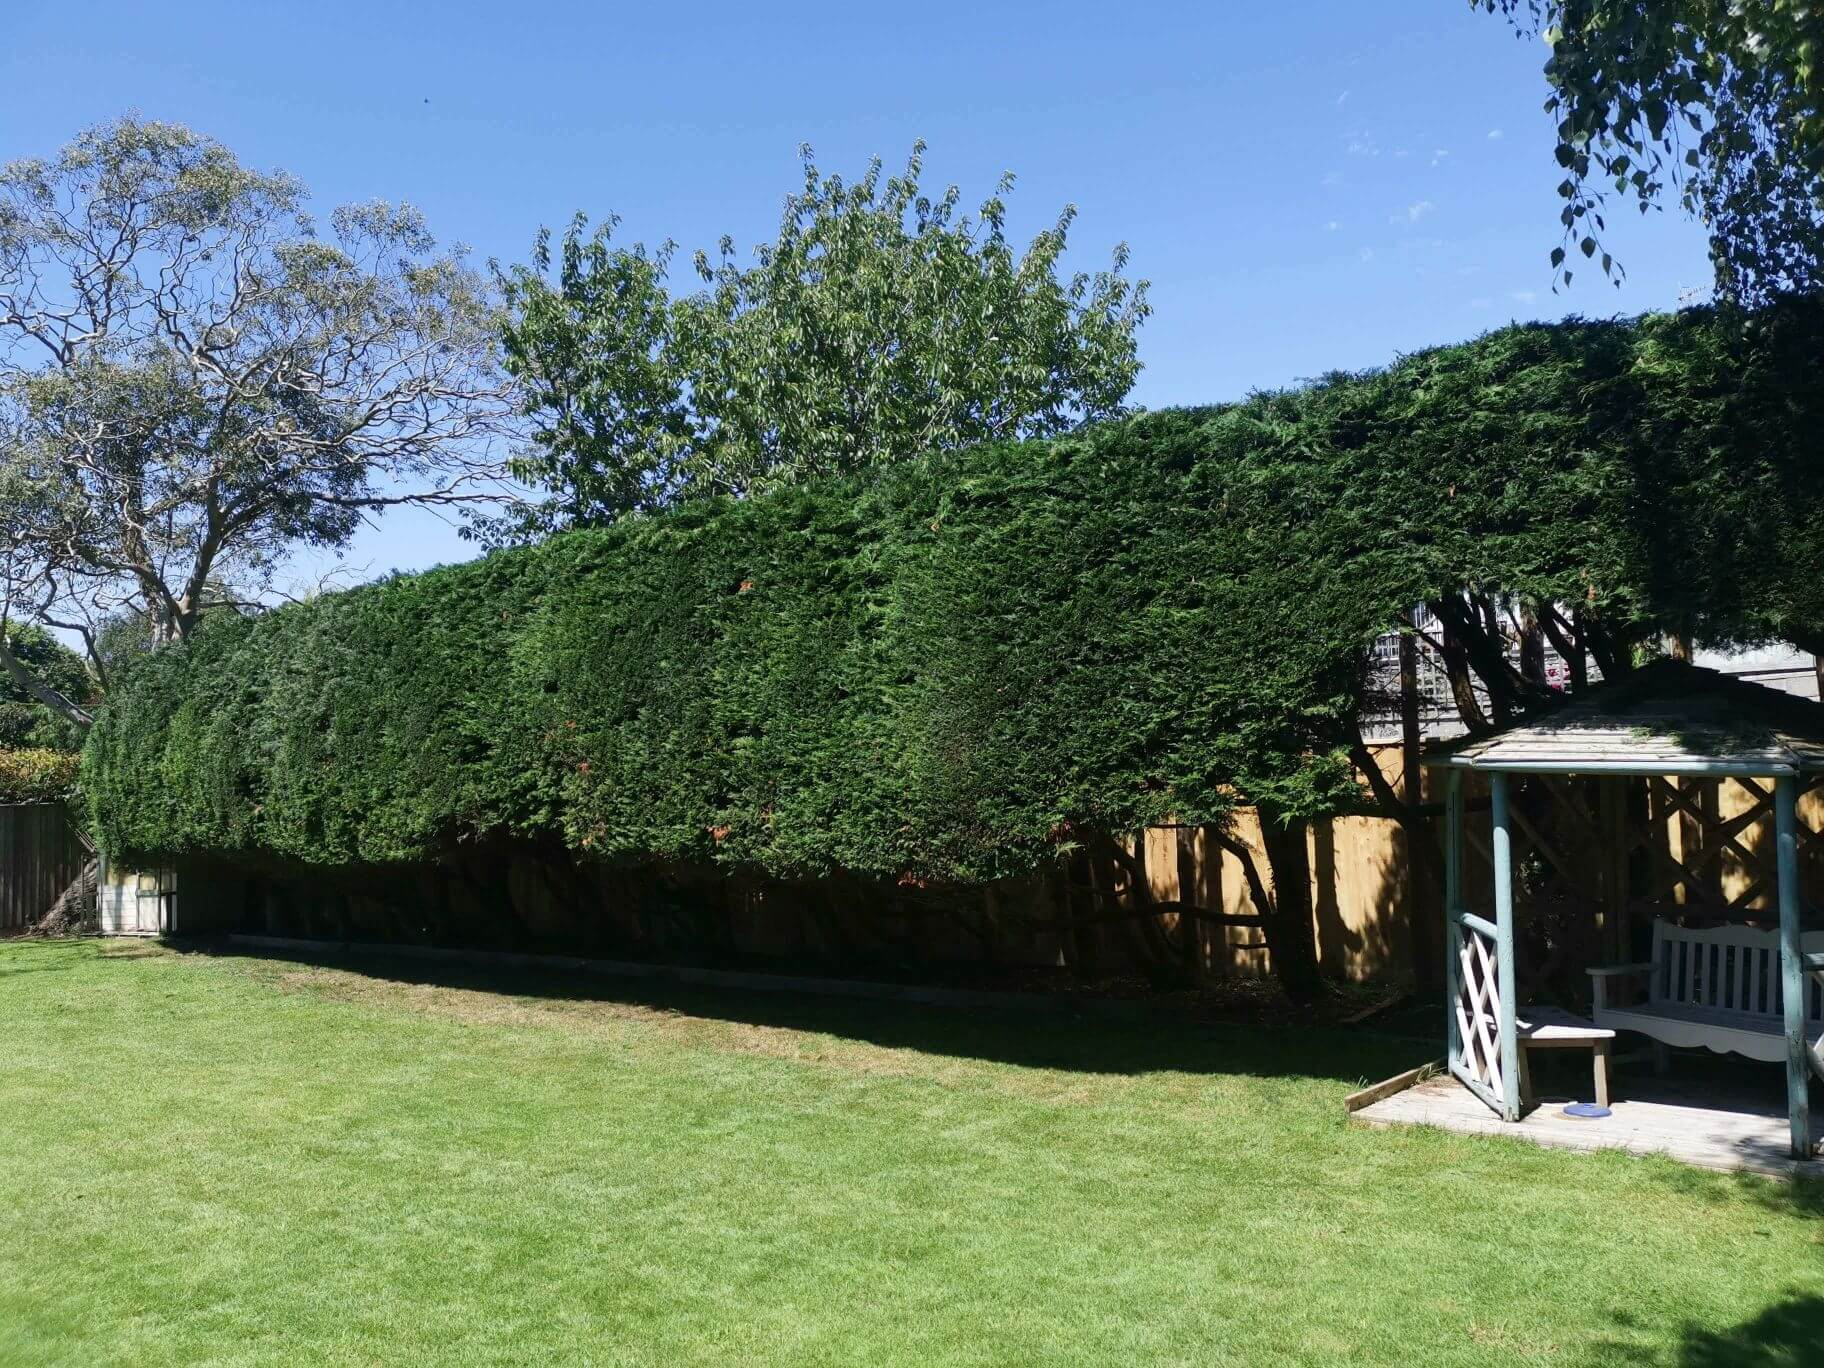 Planting Services: Image of trimmed hedges.